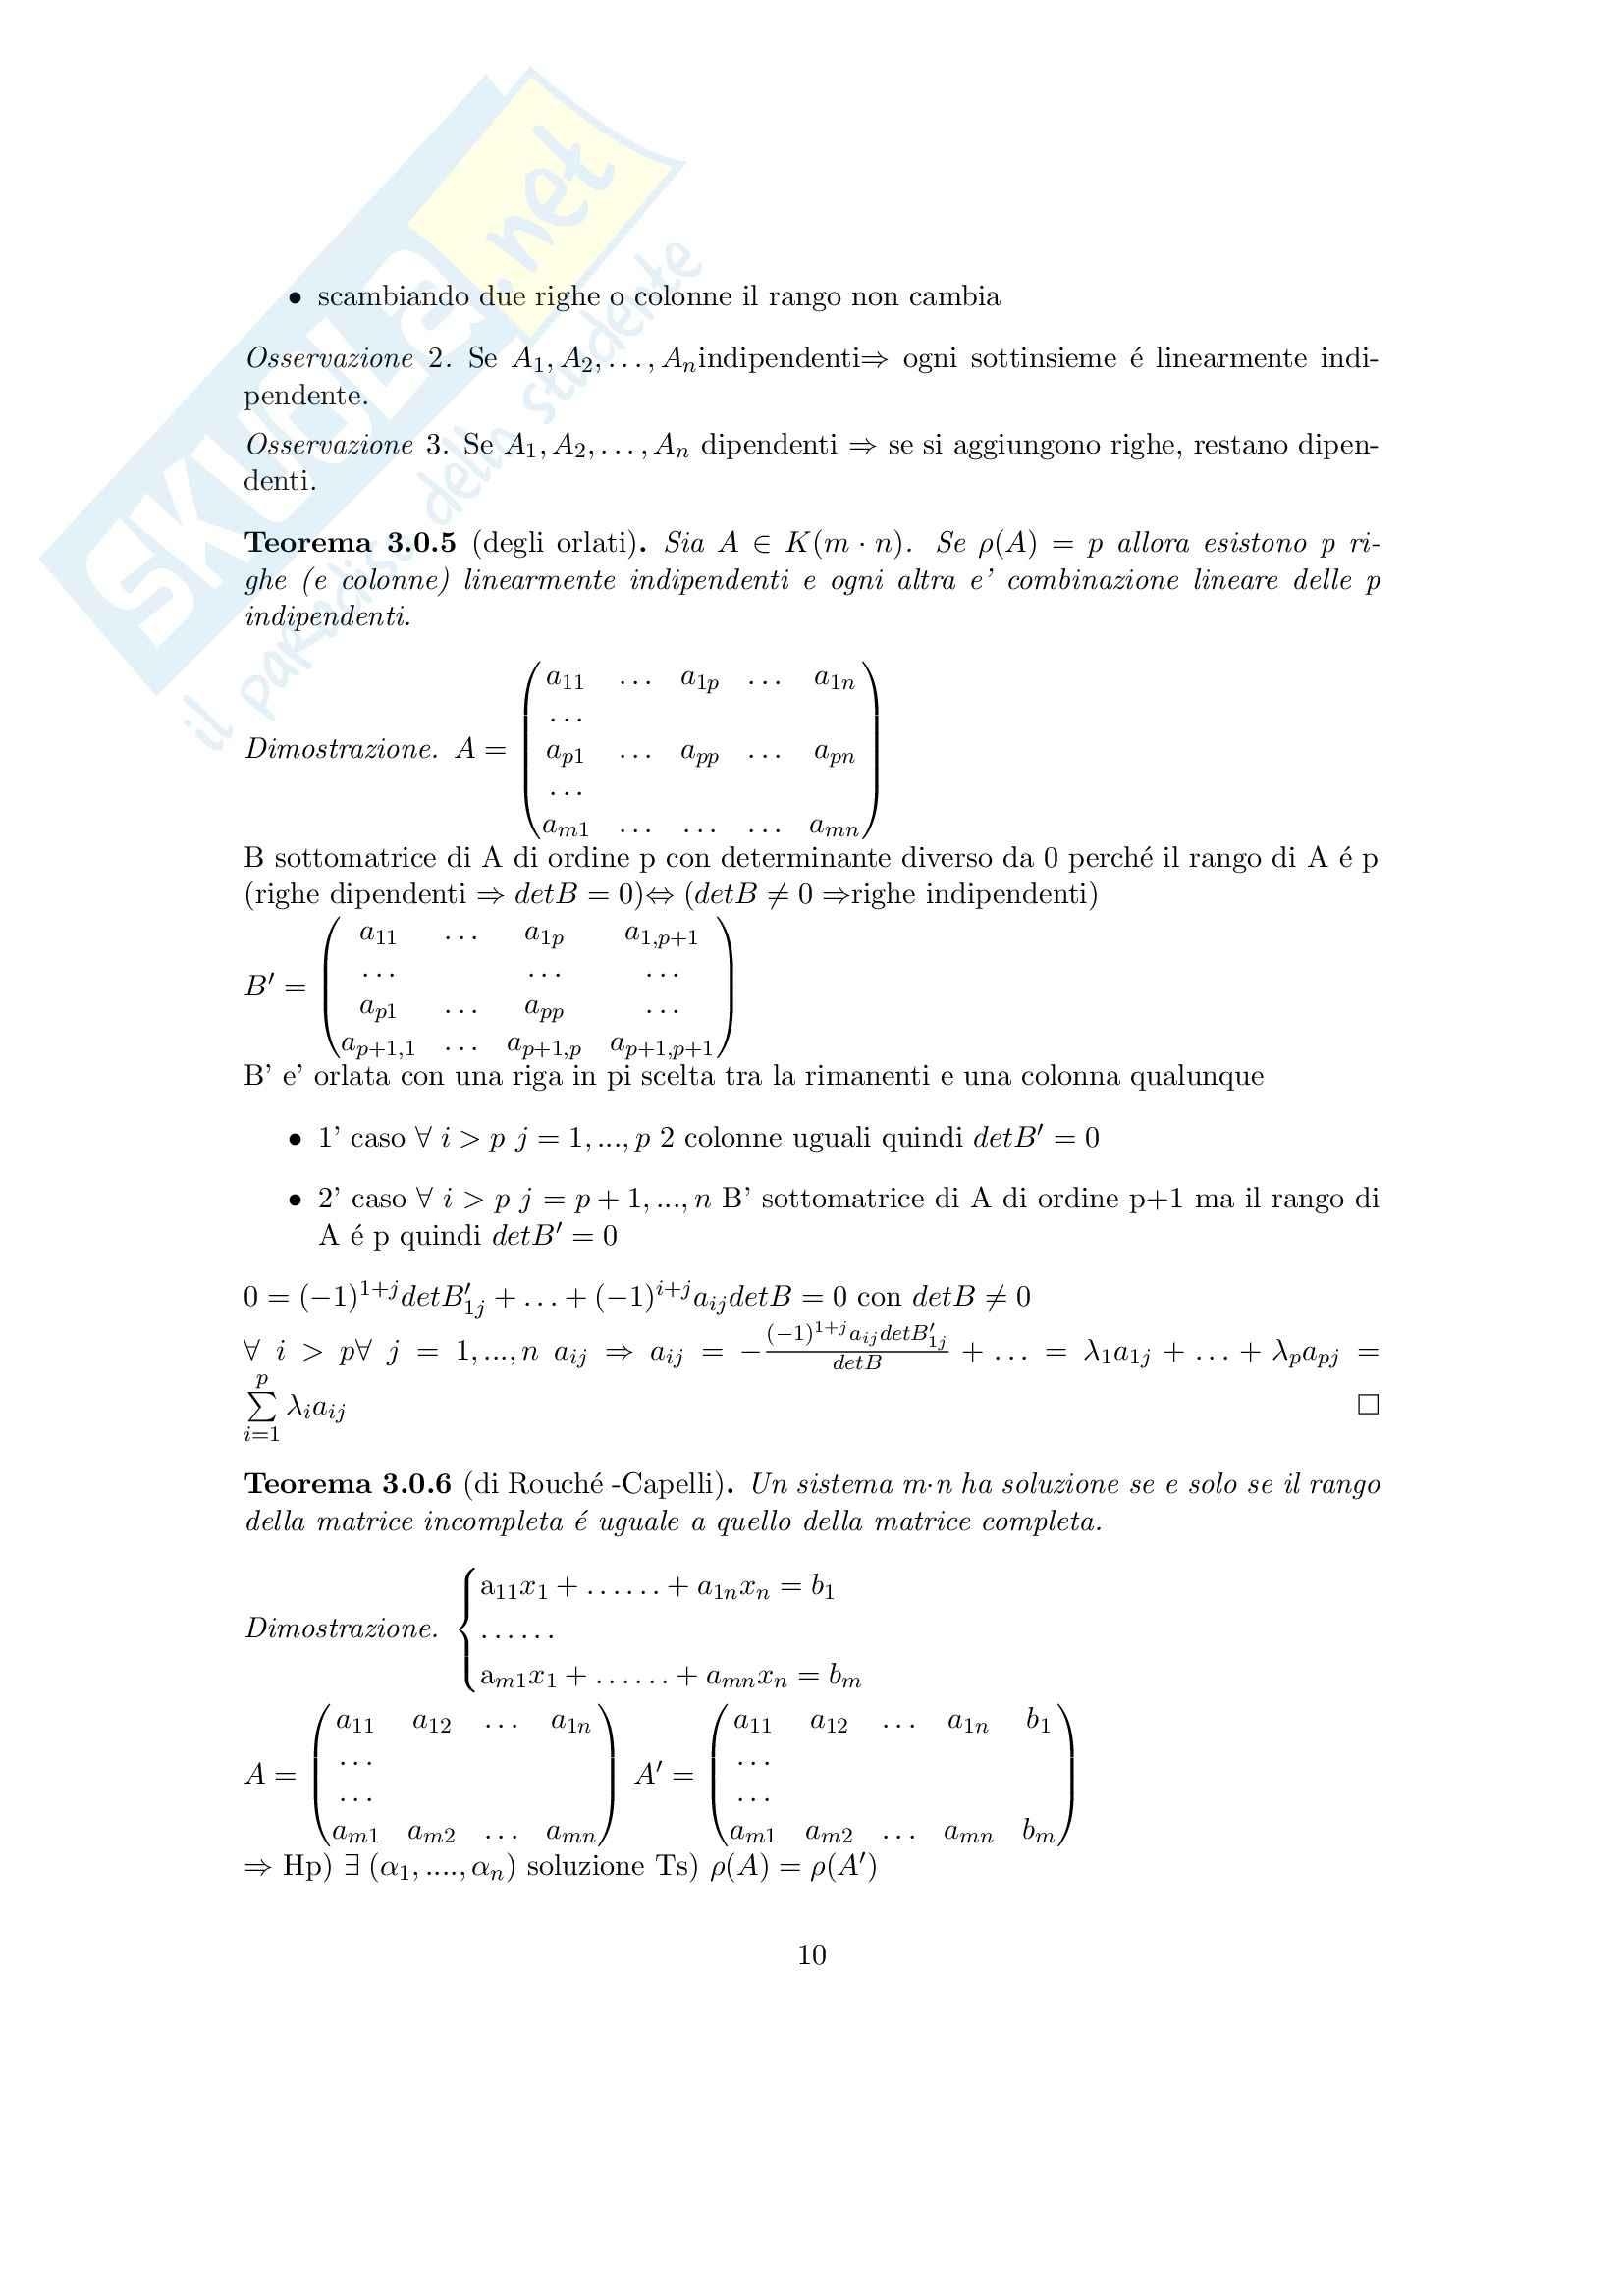 Algebra lineare e geometria - Appunti Pag. 11